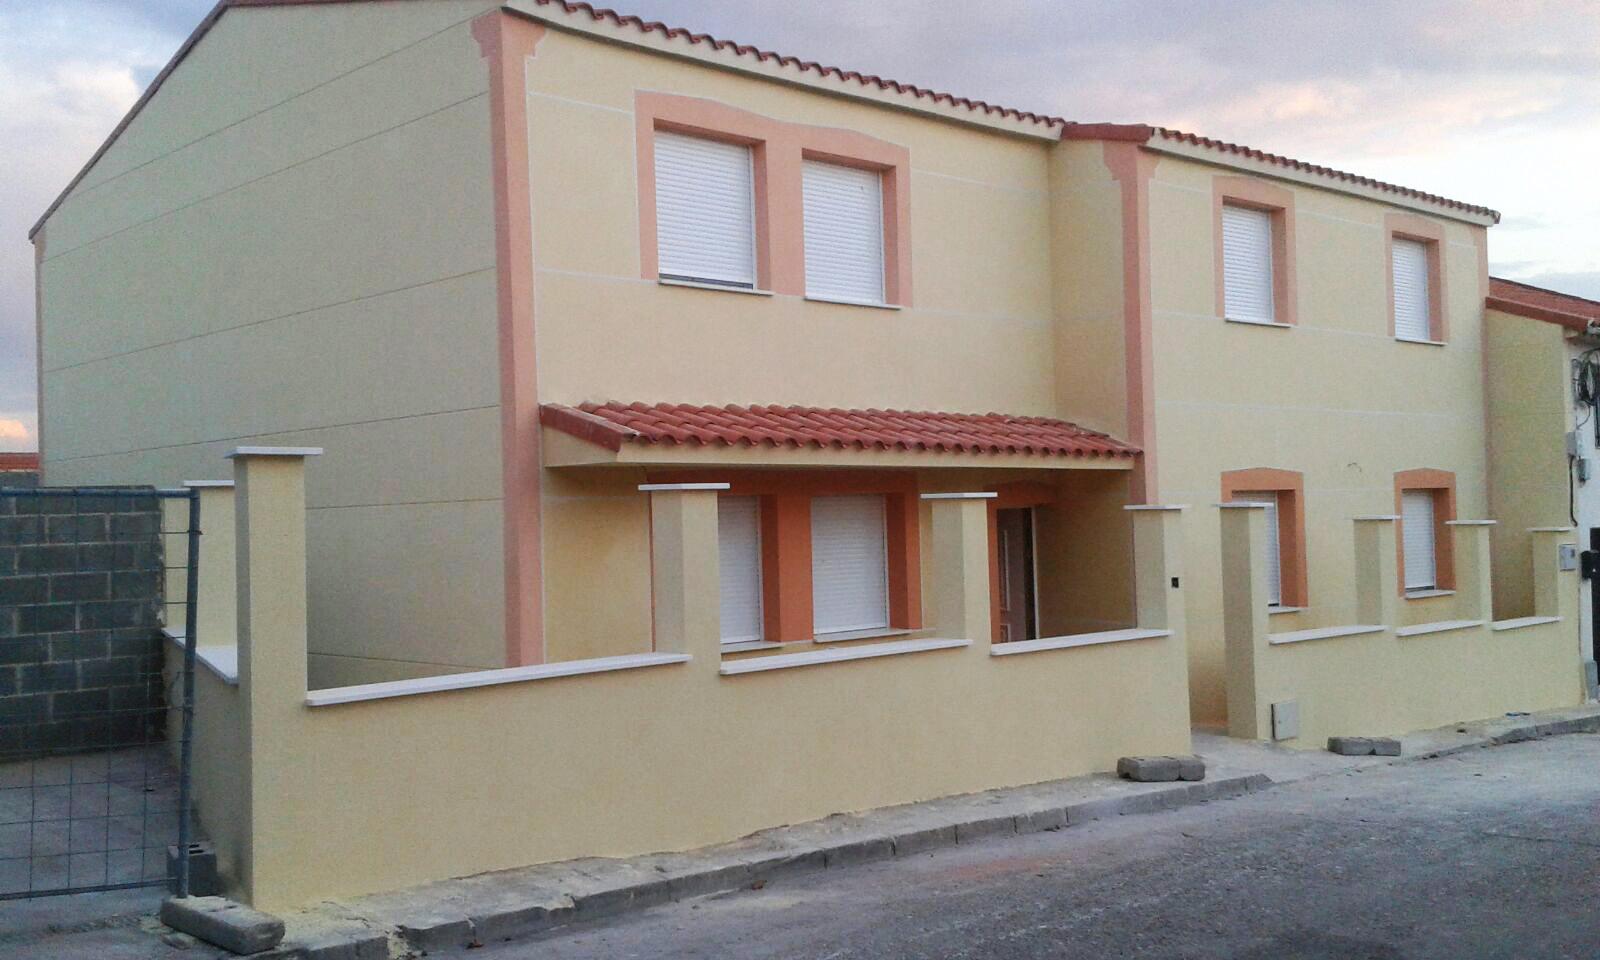 Fachada de vivienda unifamiliar lm reformas albacete for Fachadas de viviendas